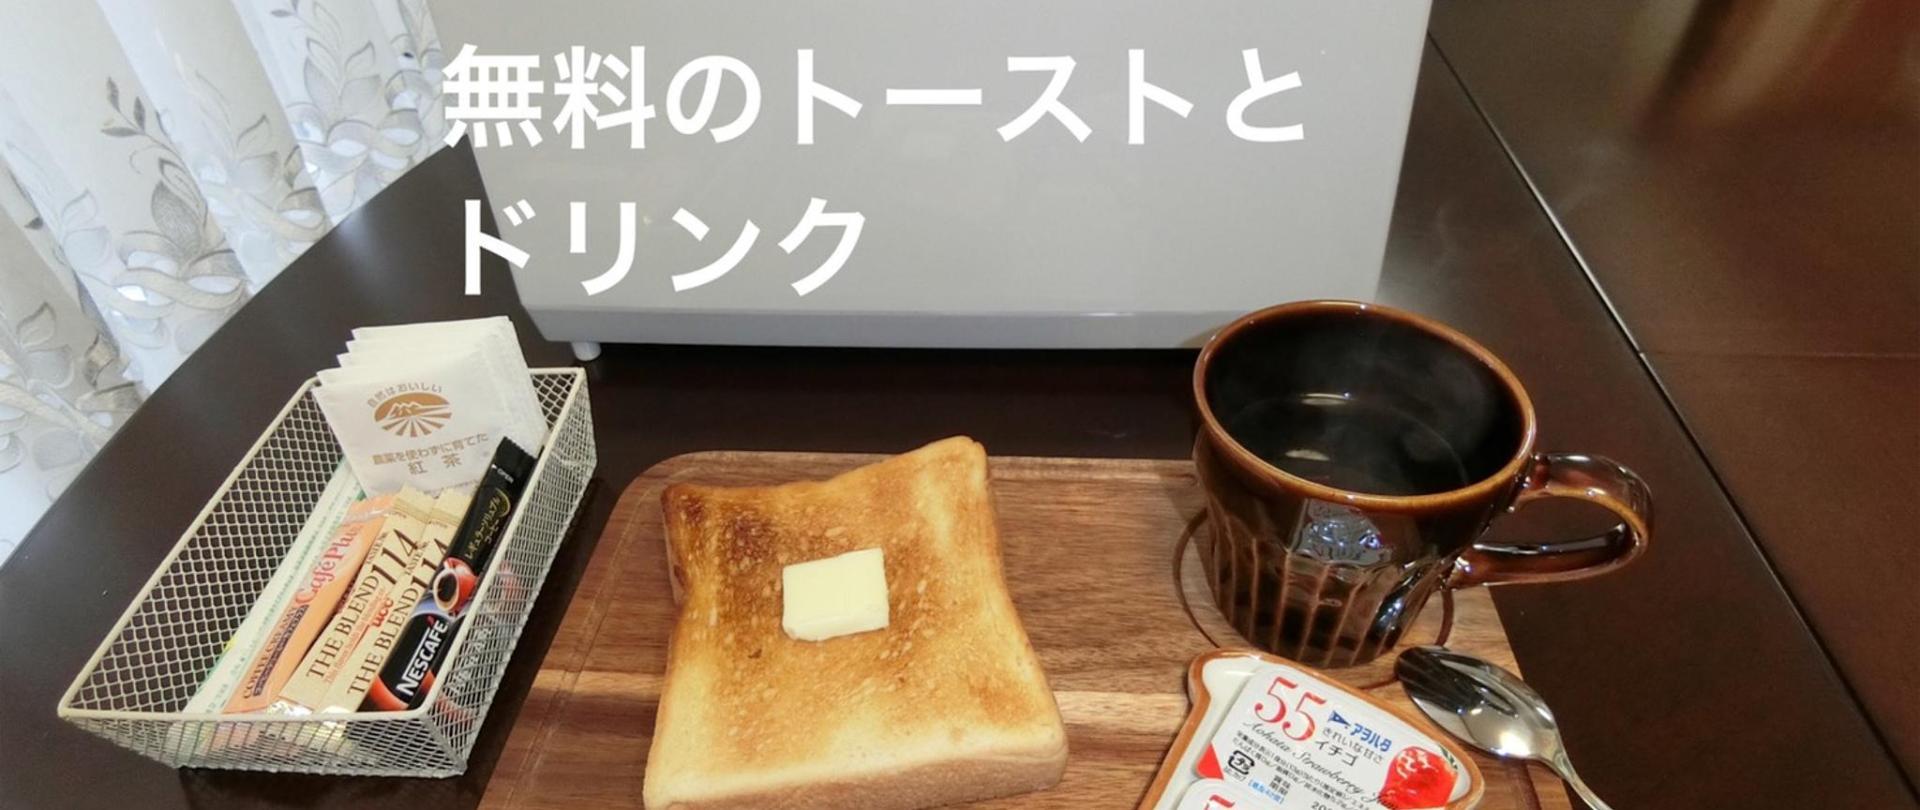 【宮崎】 朝食 ネット用写真 2.jpg